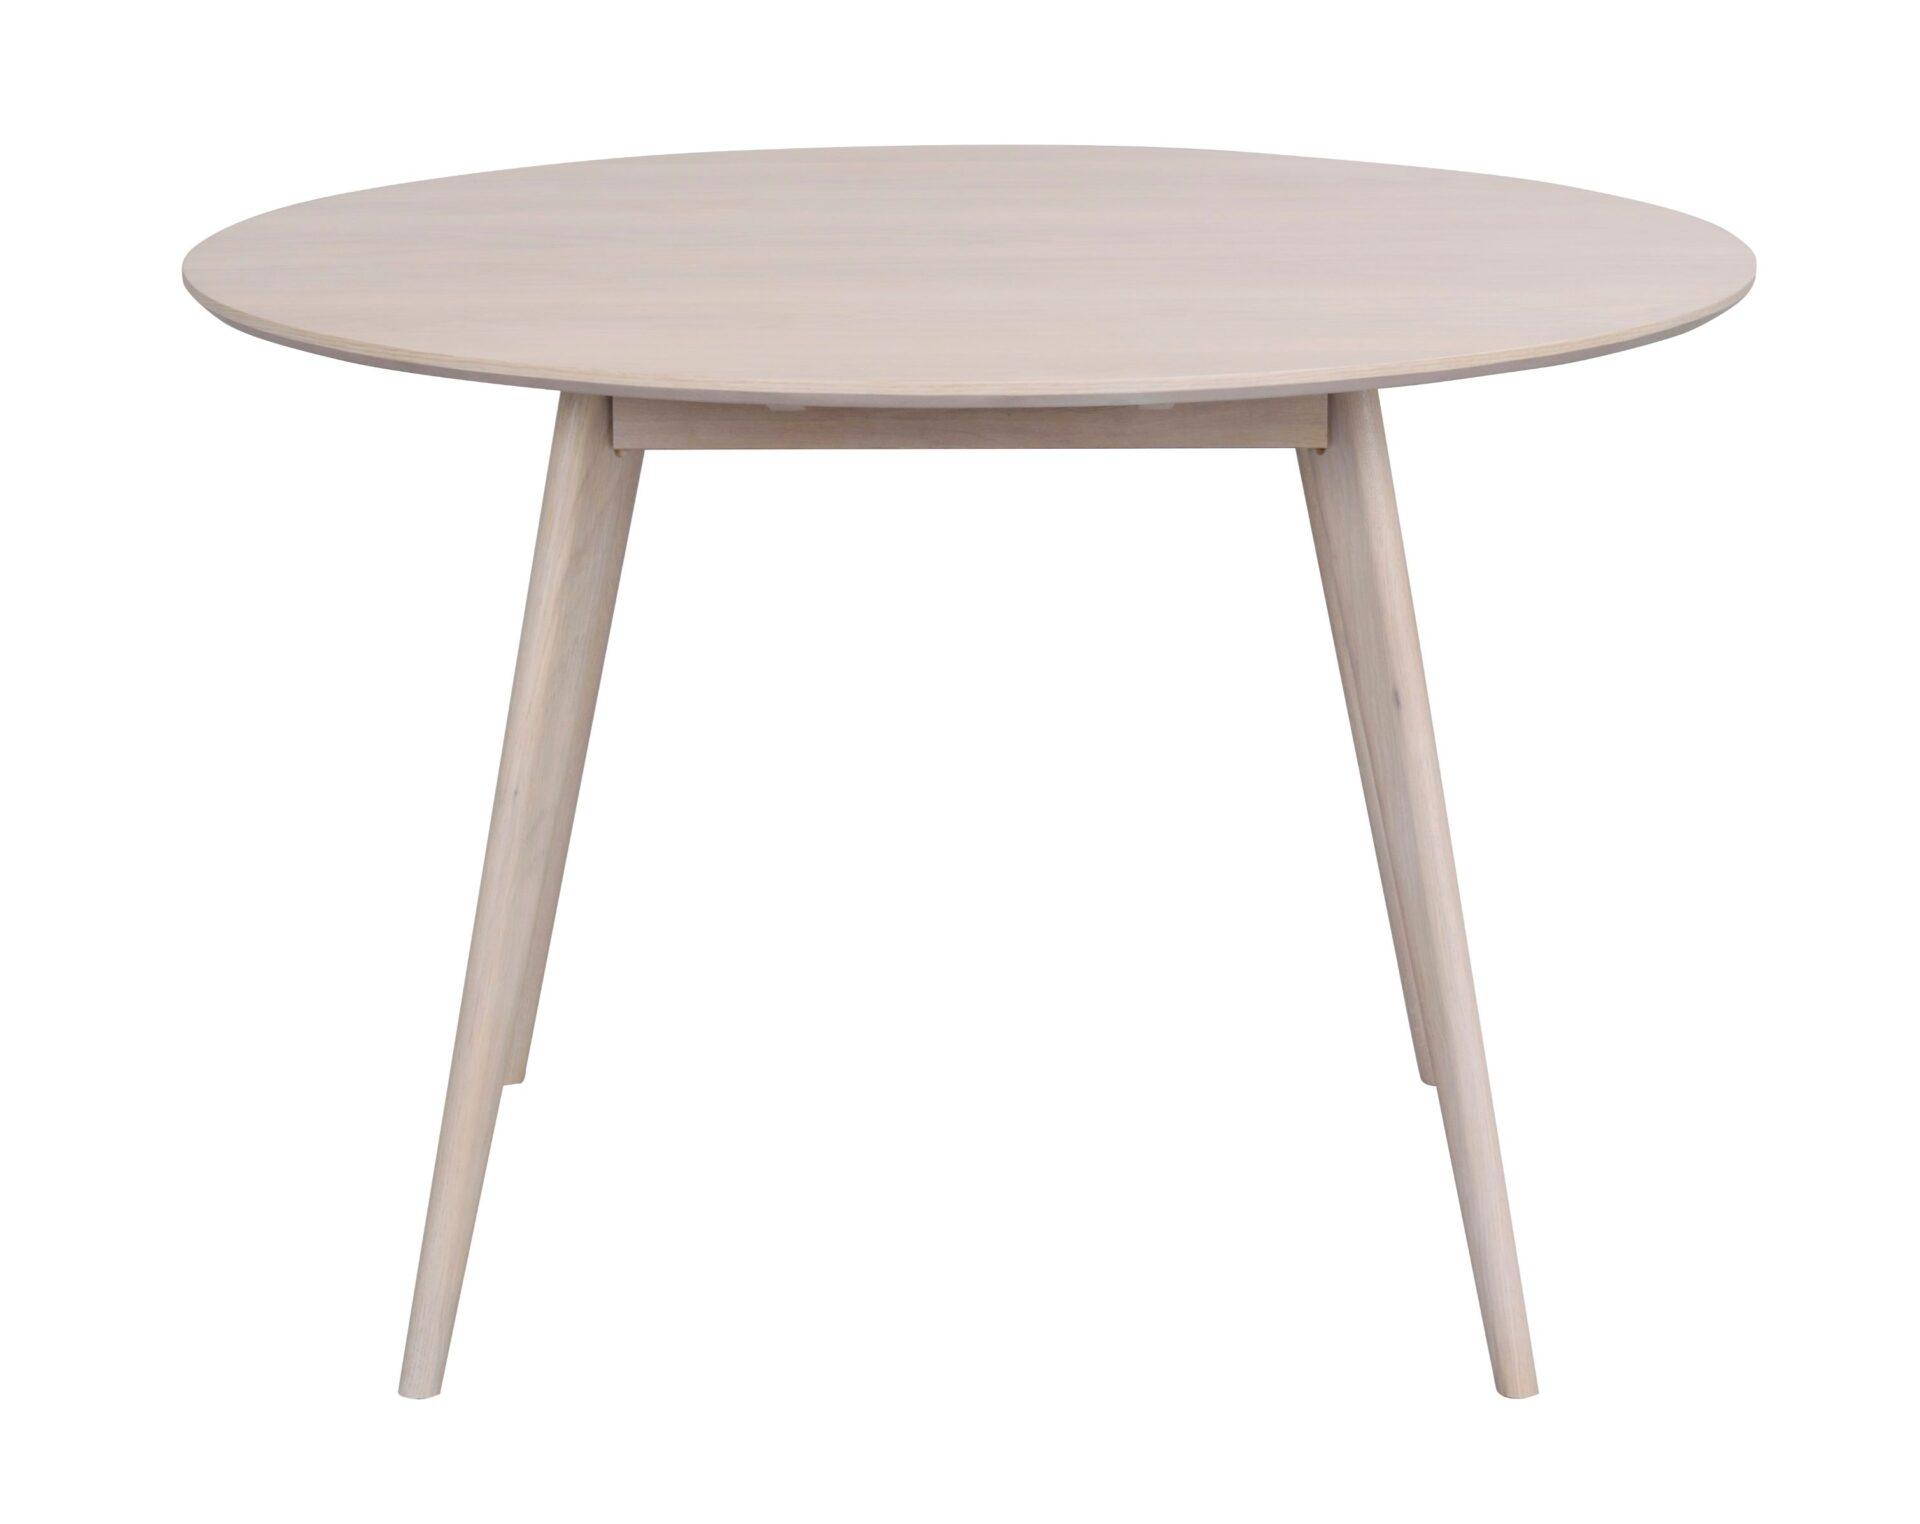 Rowico Yumi Dining Table Round 9 Whitewash Oak